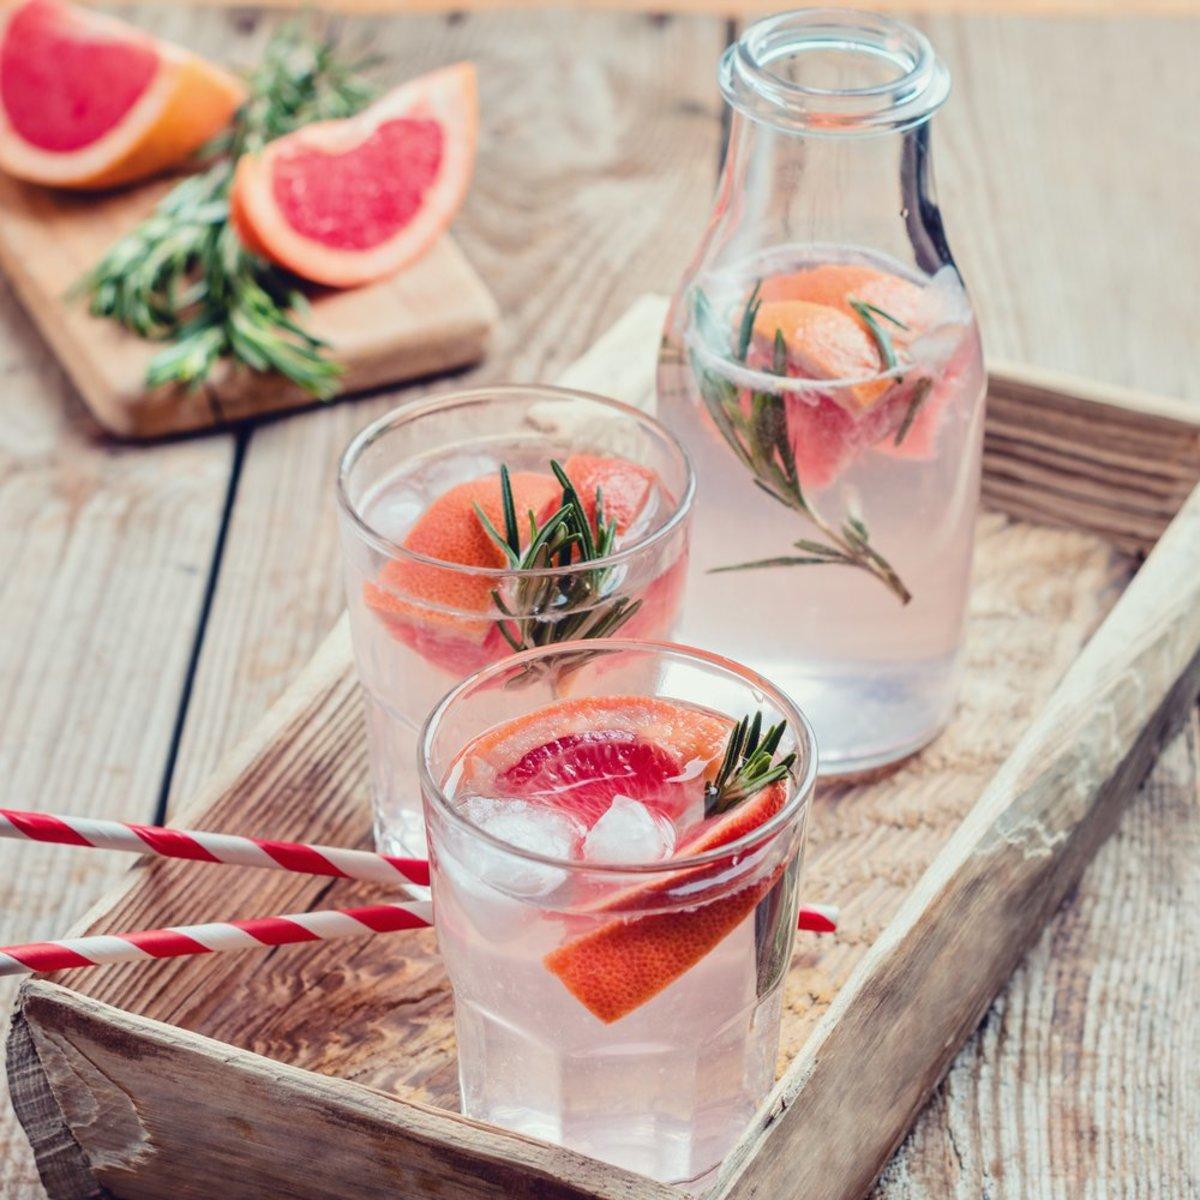 grapefruit-infused water